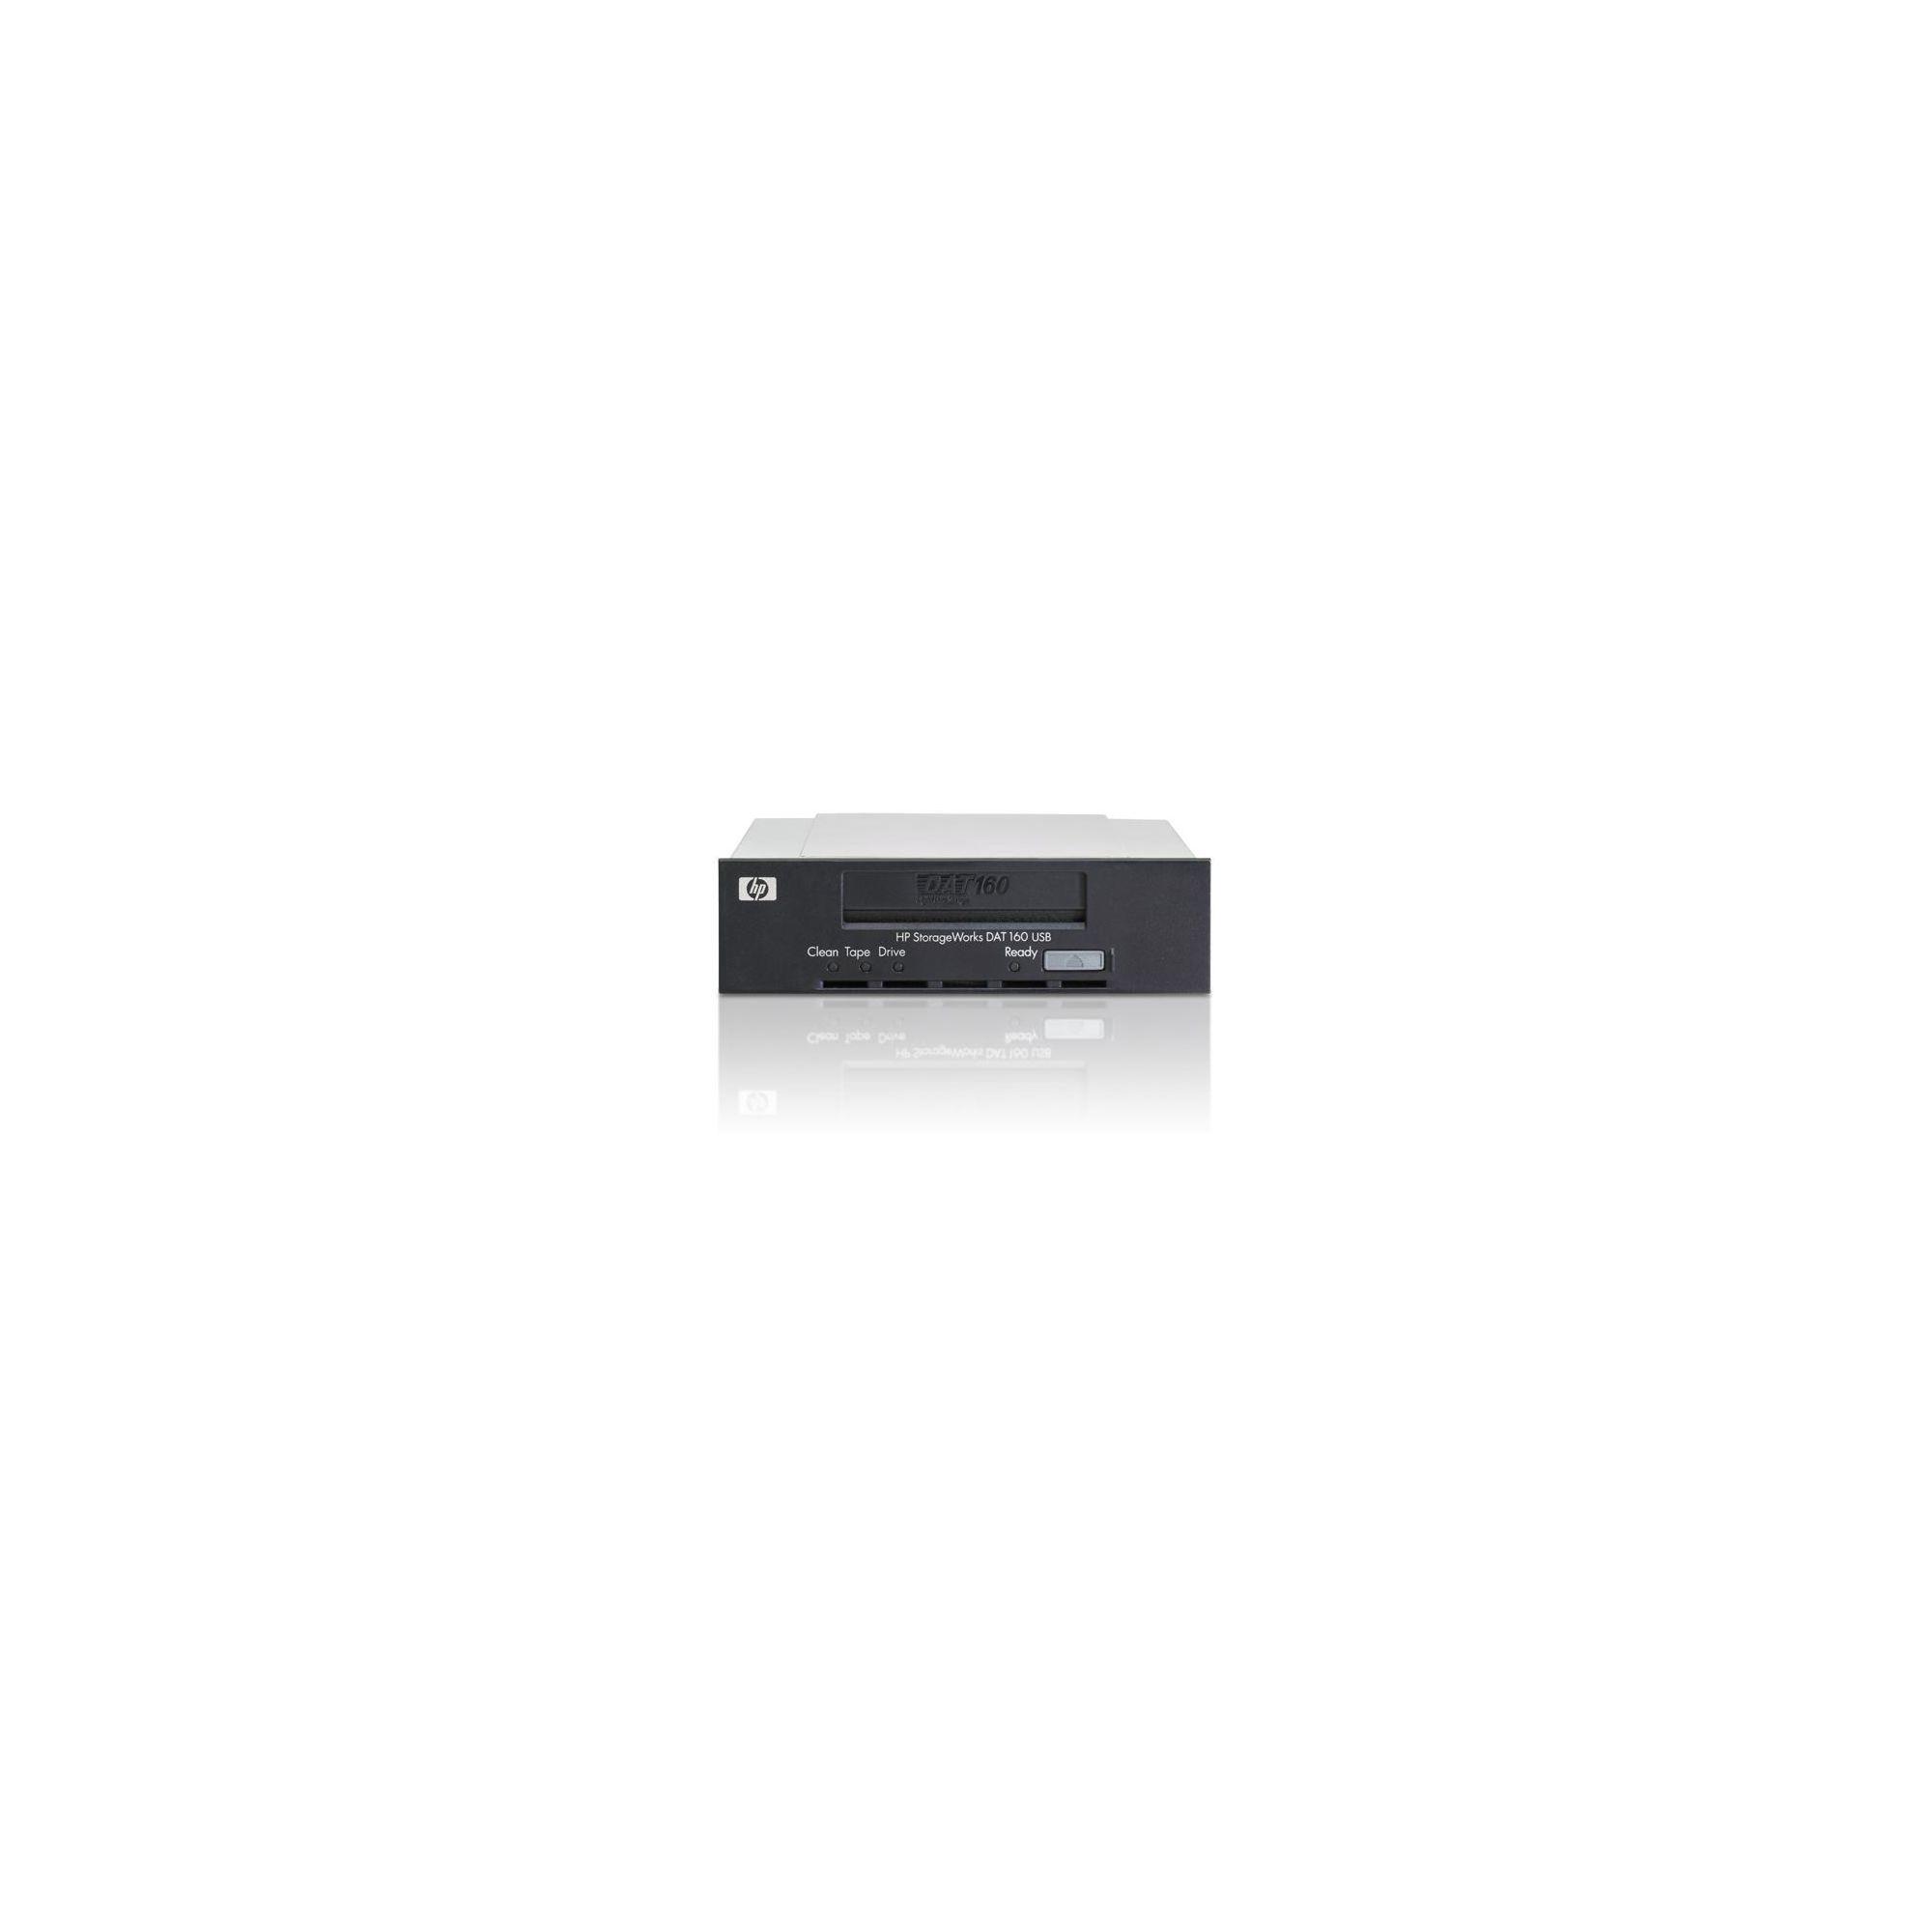 Hewlett-Packard StorageWorks DAT 160 SCSI USB Tape Drive at Tesco Direct